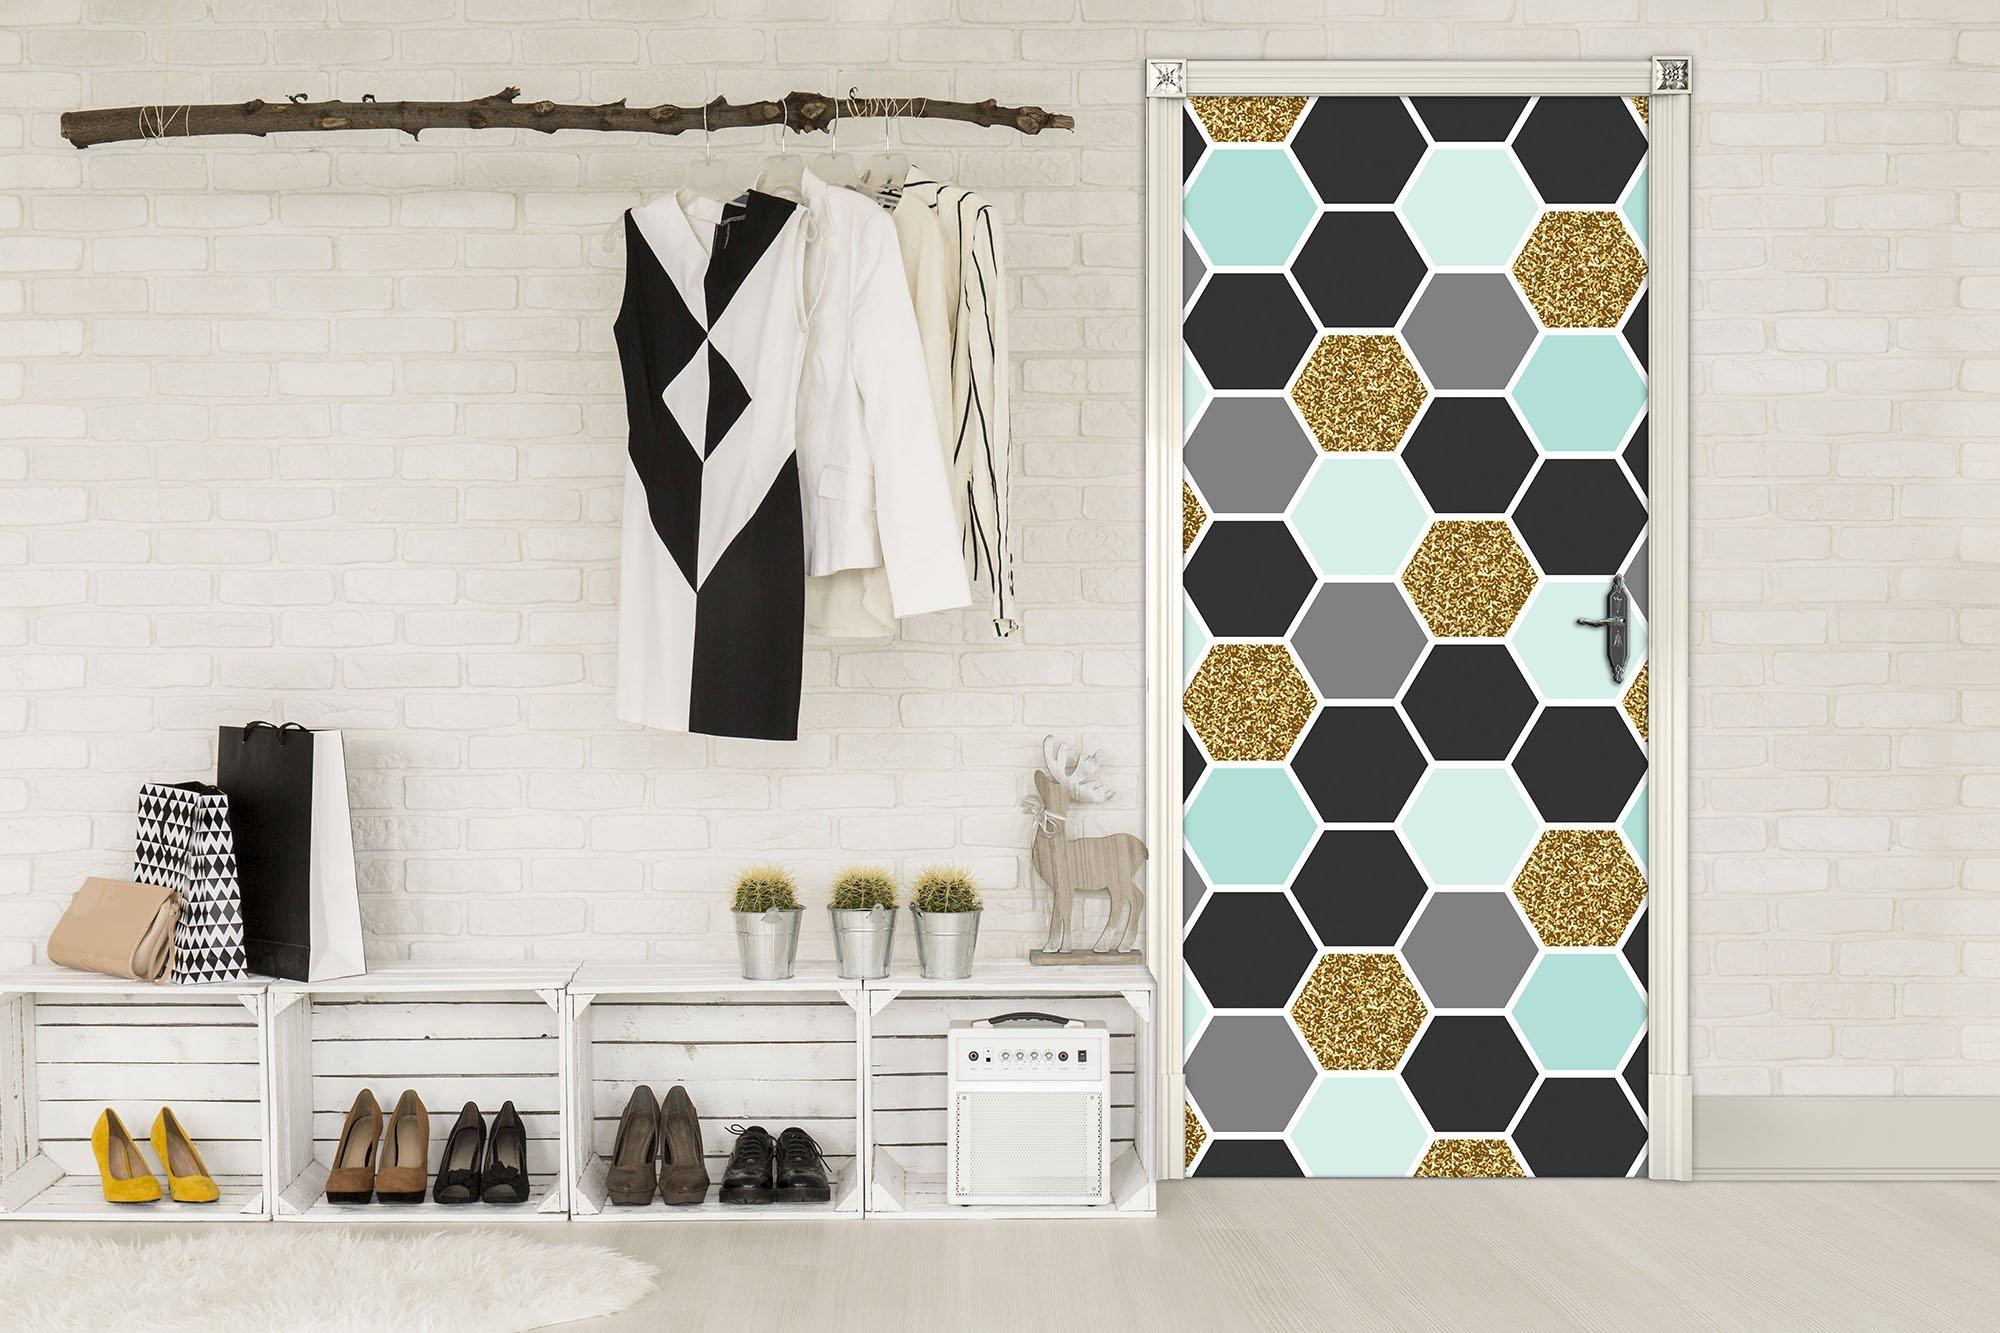 t r fototapete mit abstrakten sechsecken. Black Bedroom Furniture Sets. Home Design Ideas